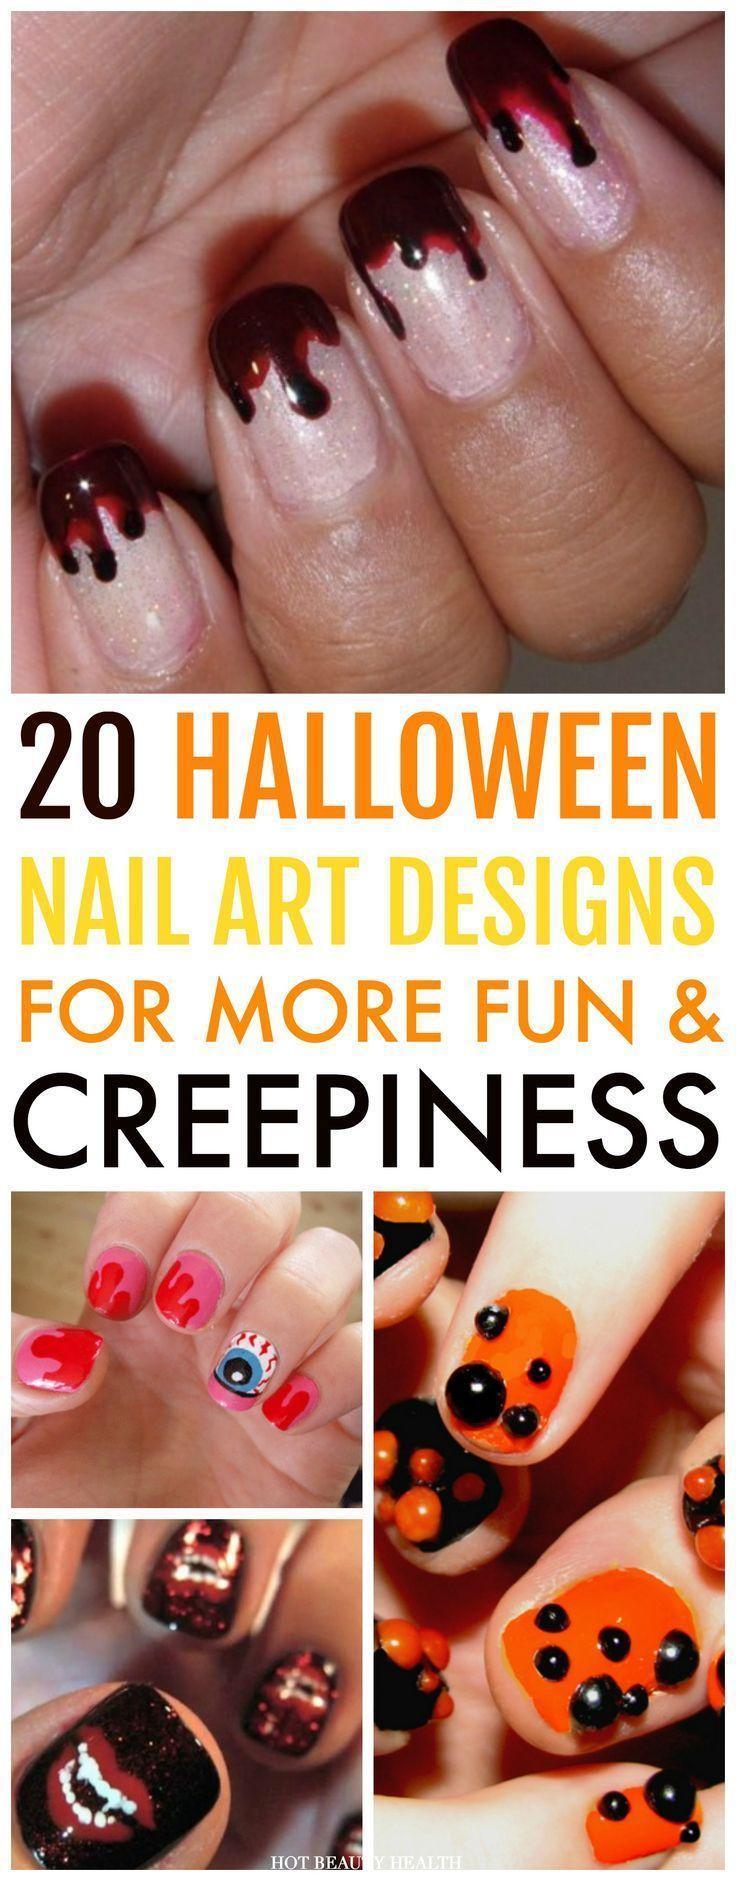 20 gruselige Halloween Nail Art Designs   – Cool Nail Designs